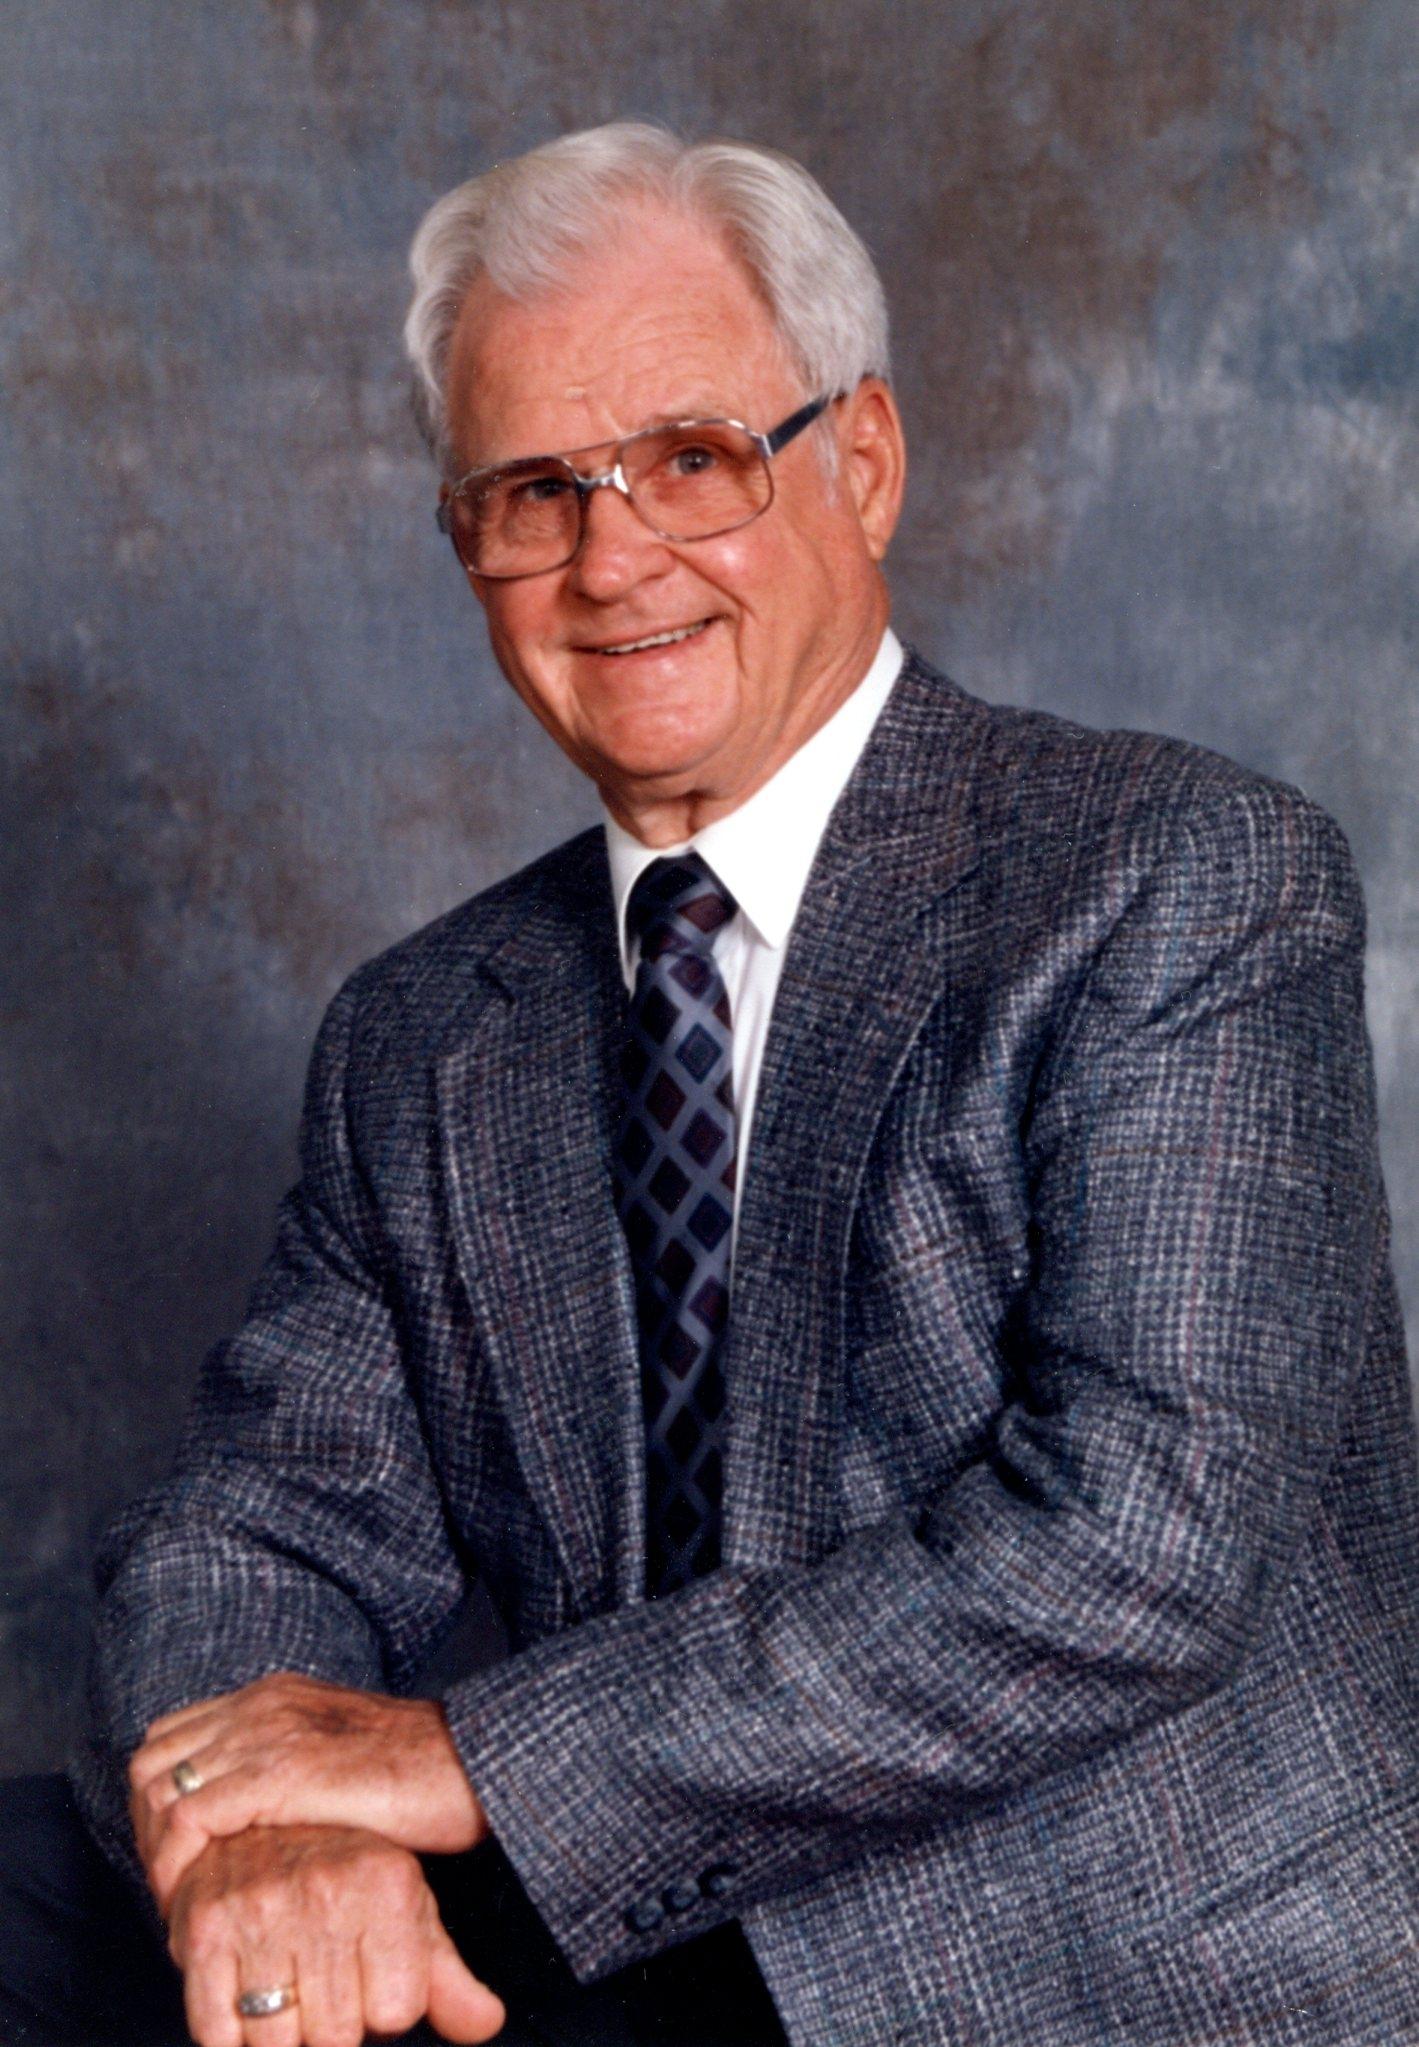 James William Tweedell